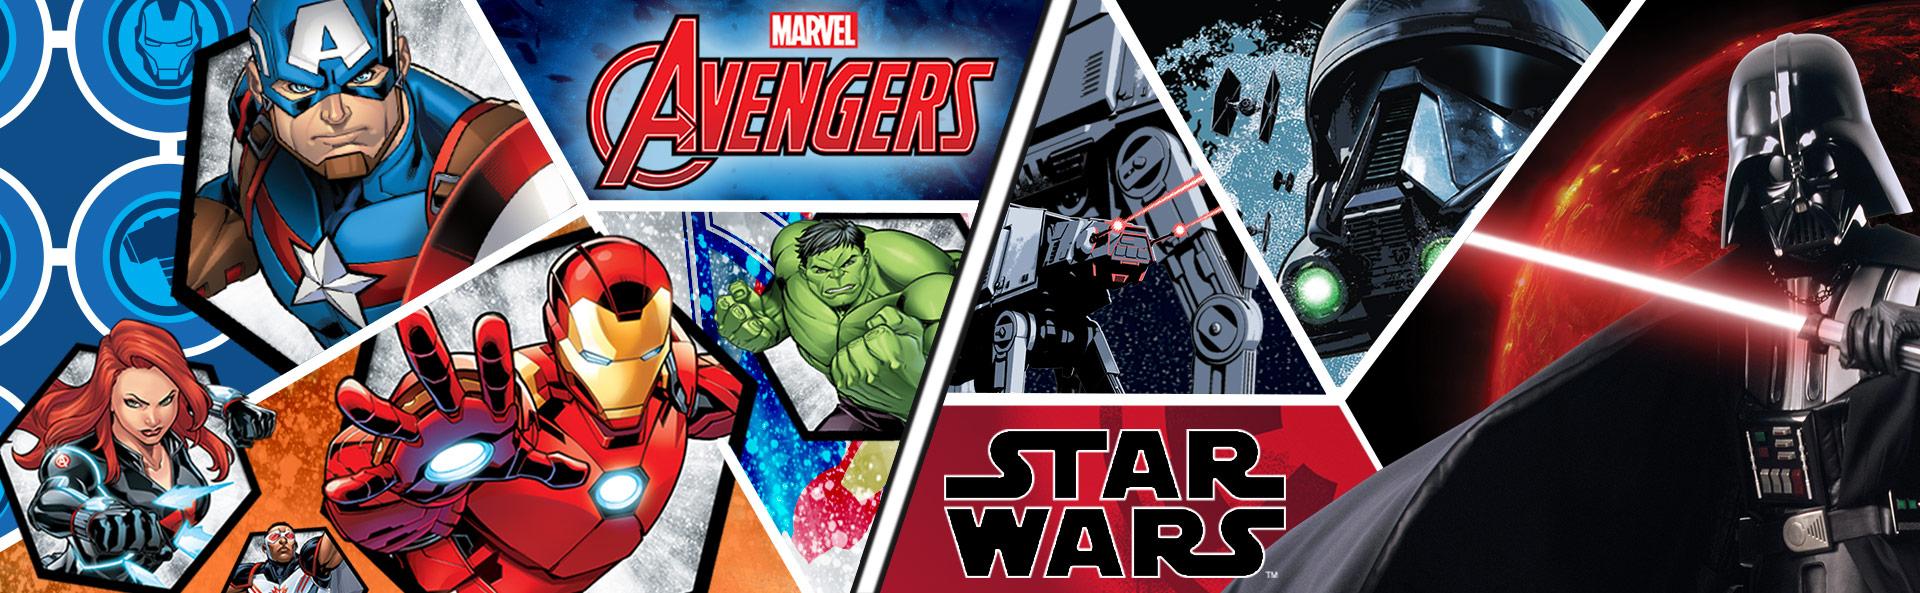 accessori zaini avengers star wars